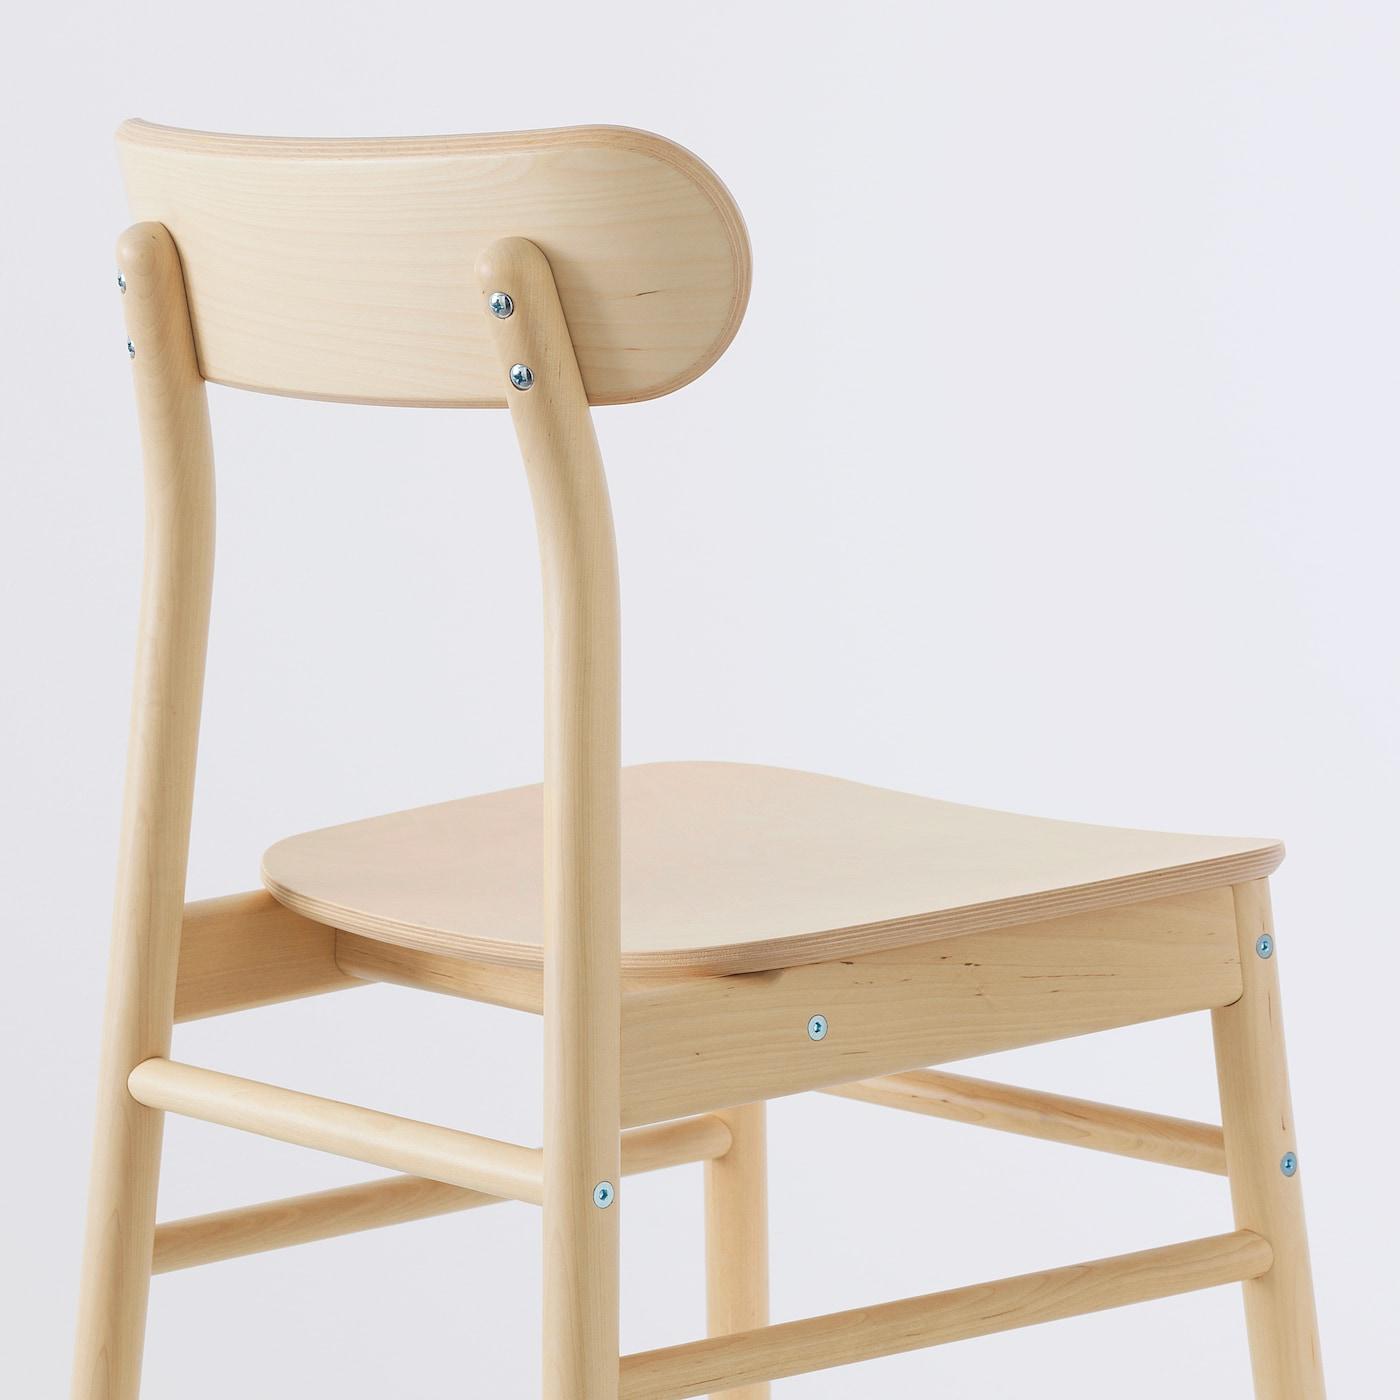 Ronninge Stuhl Birke Ikea Osterreich